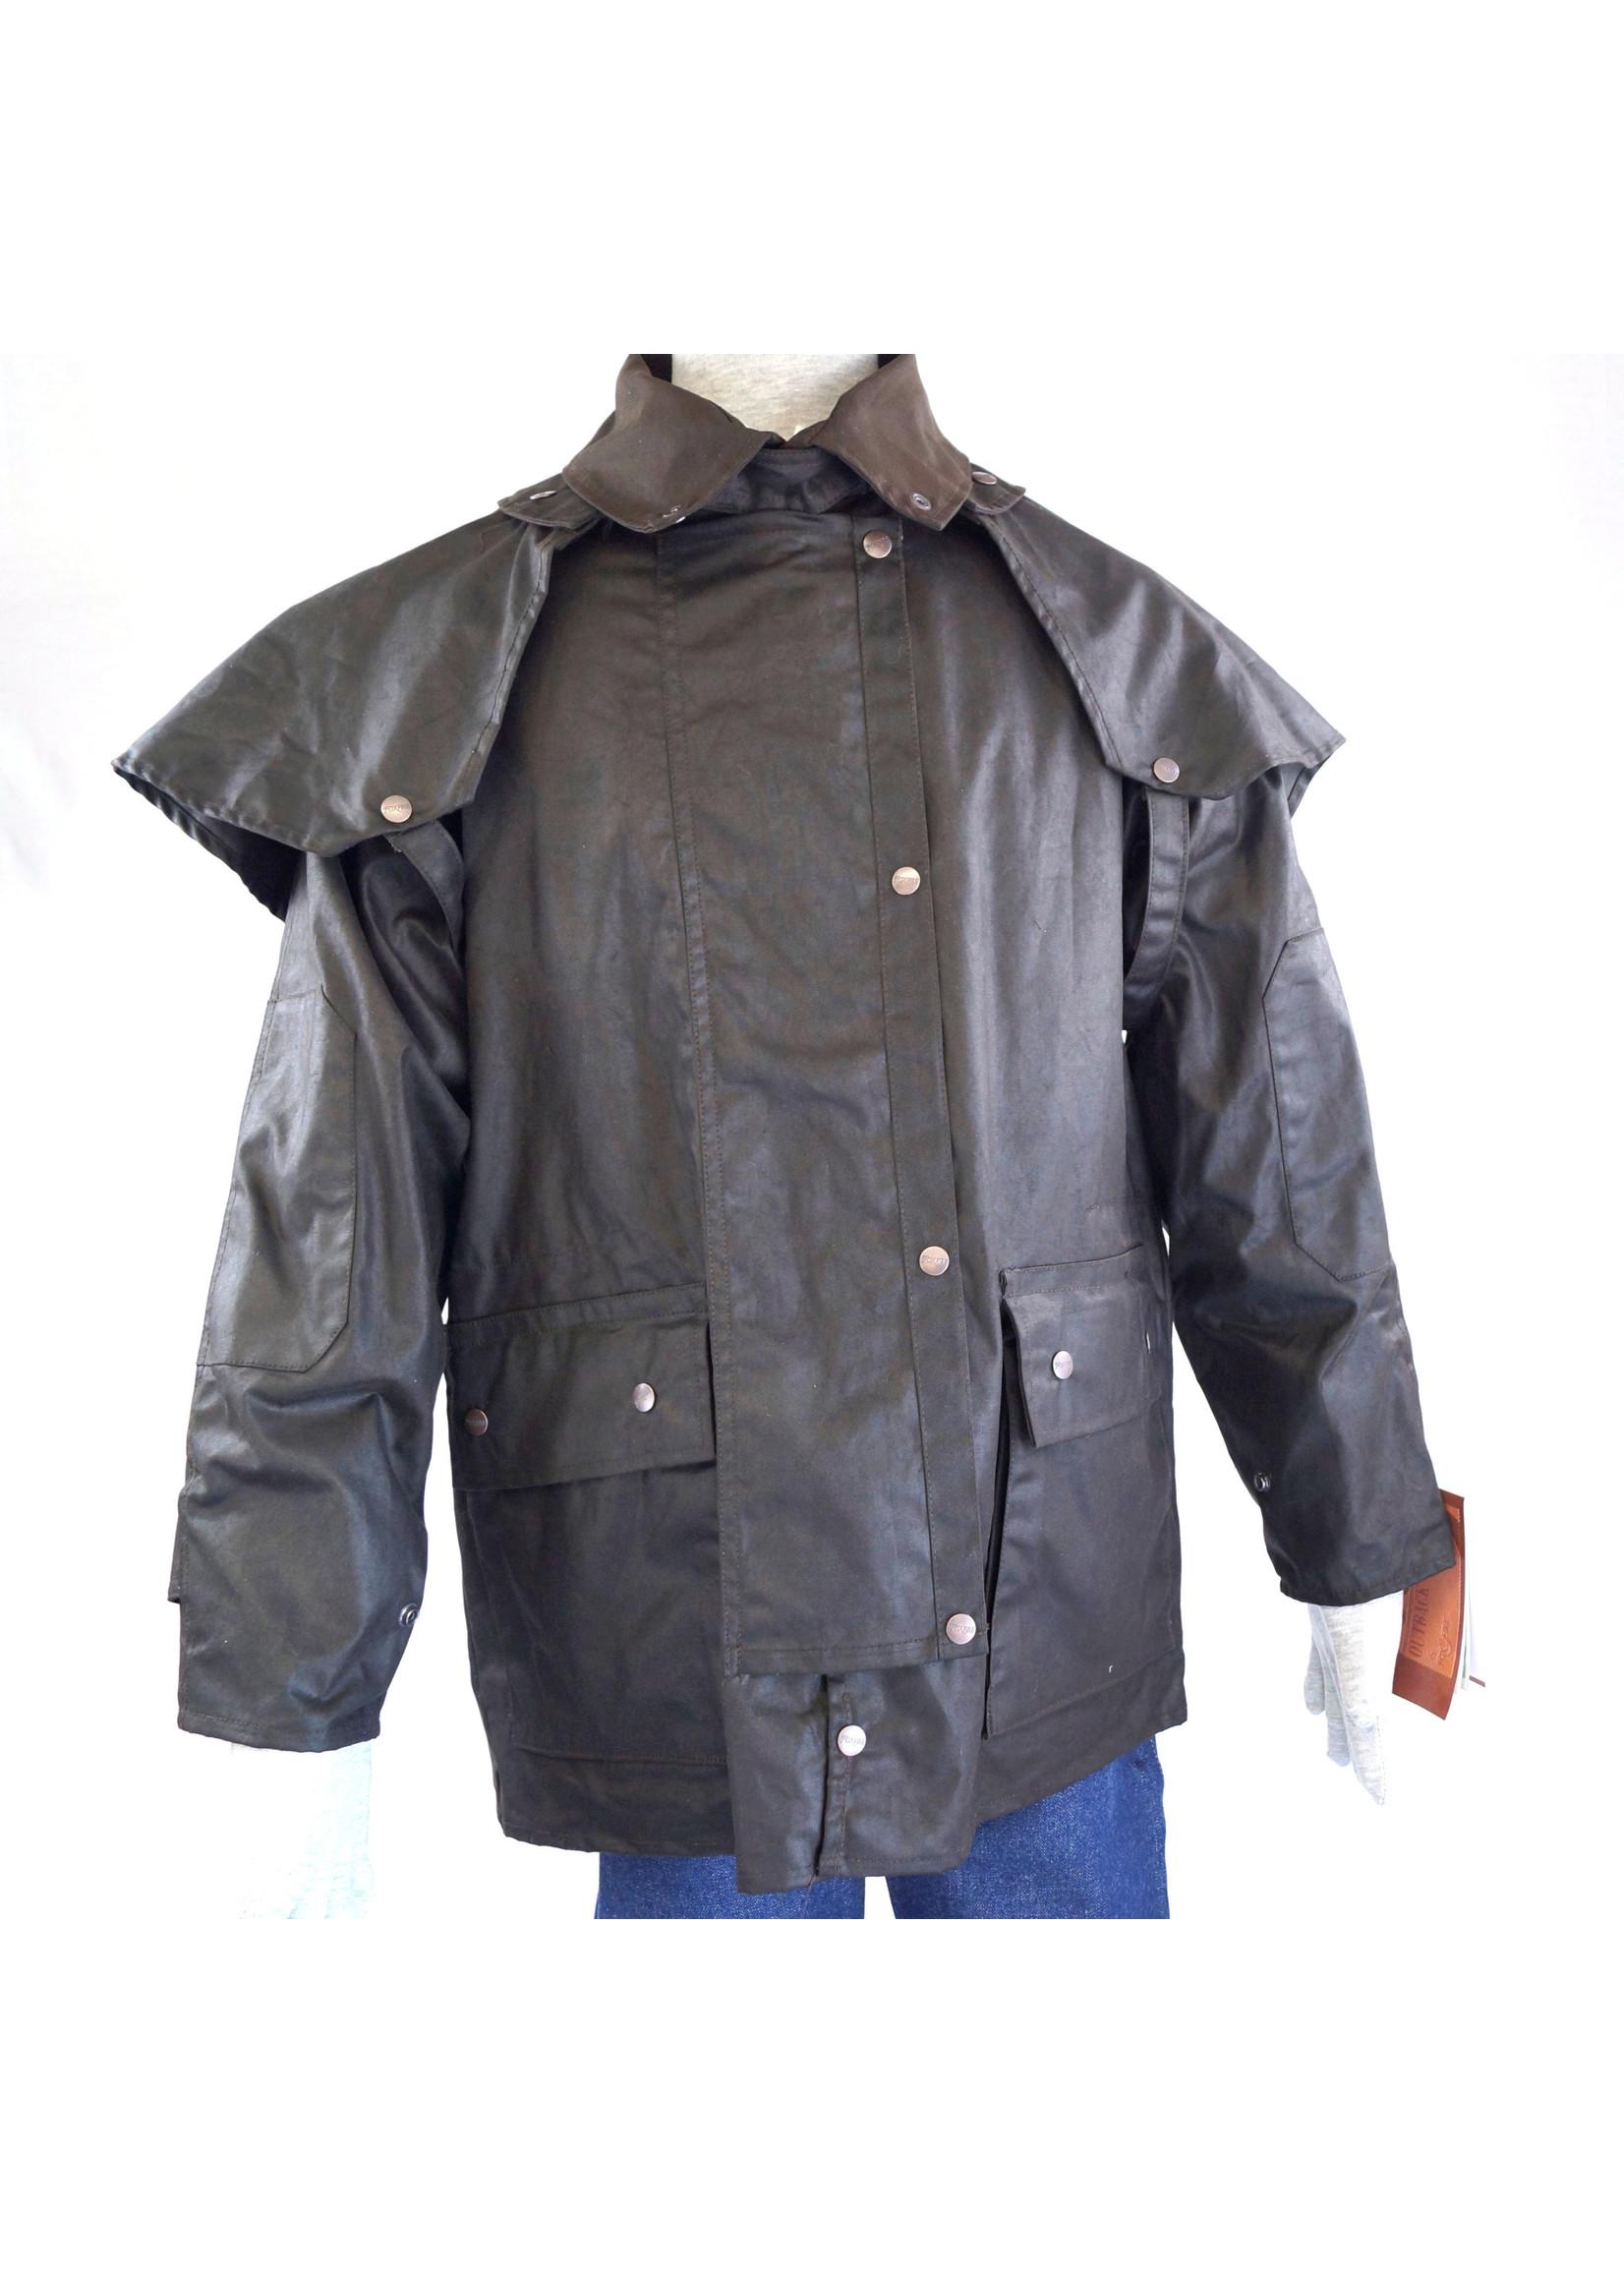 Brown Australian Outback Short Duster Jacket